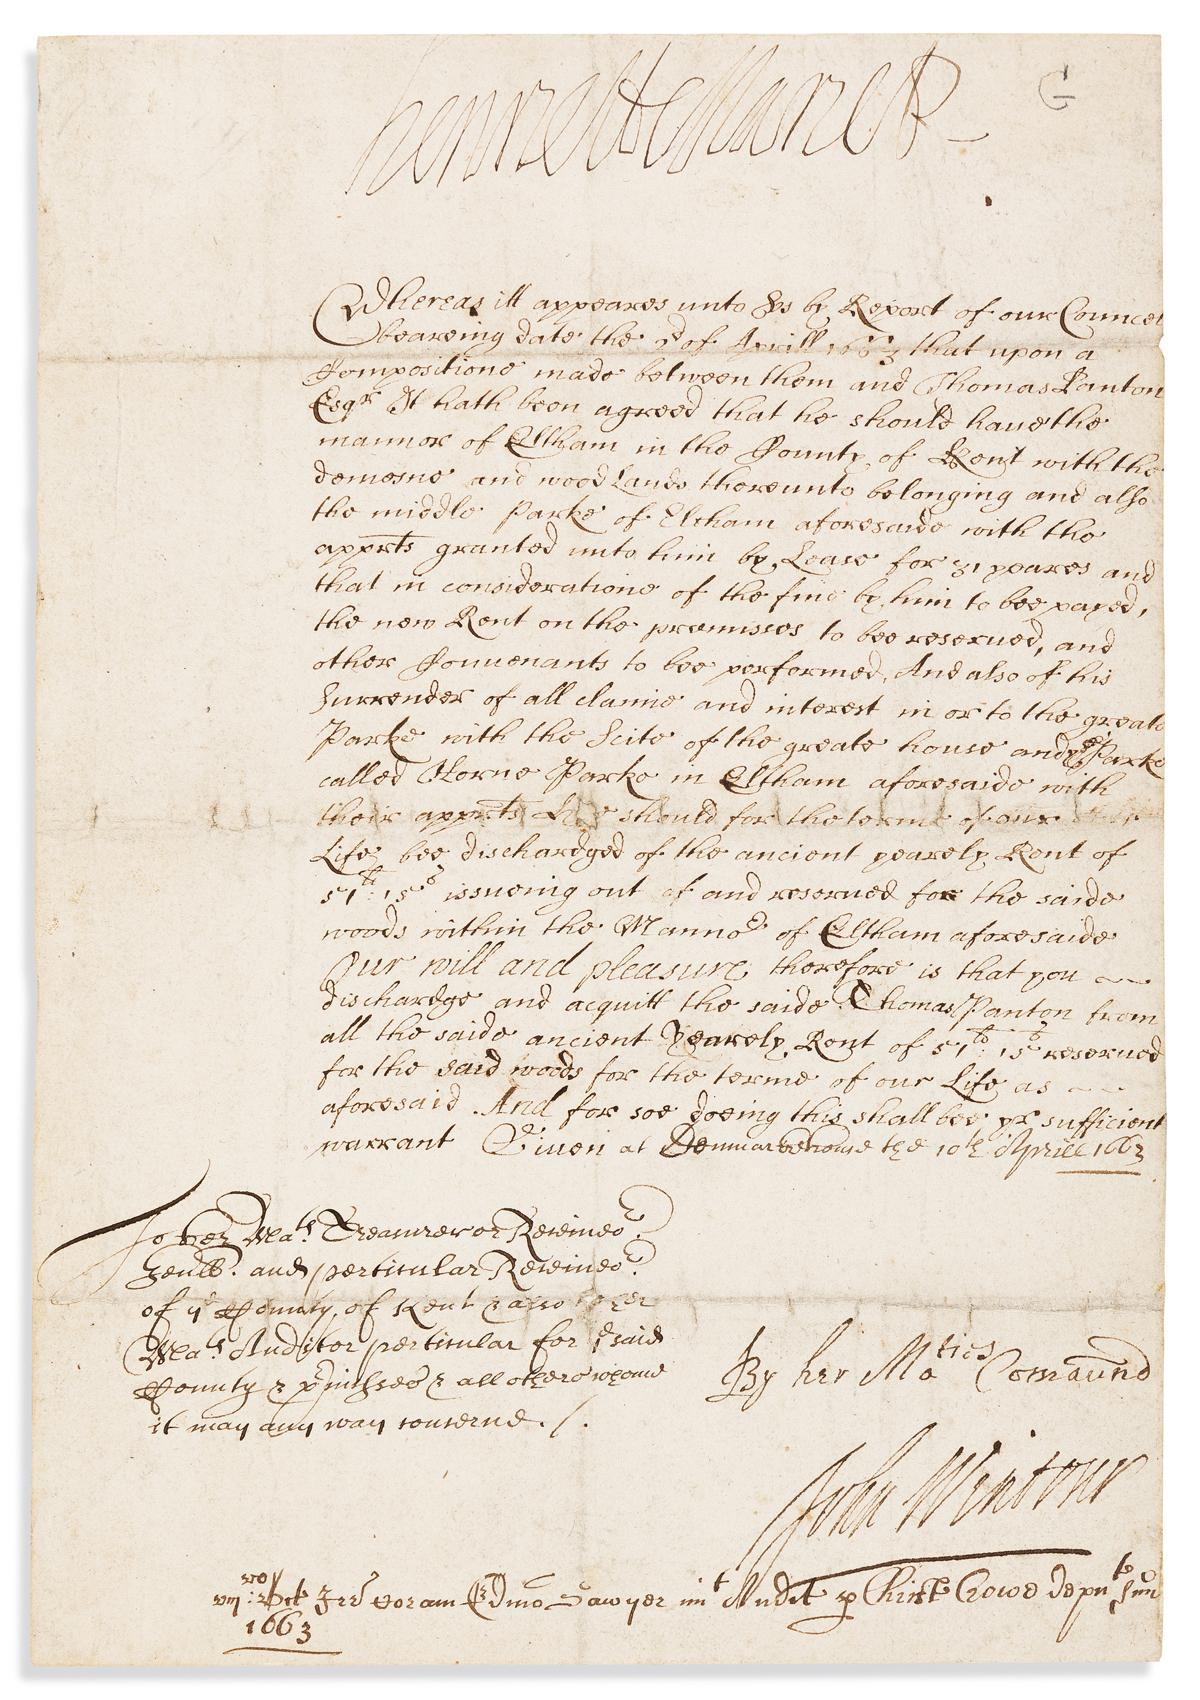 HENRIETTA MARIA; QUEEN OF CHARLES I OF ENGLAND. Document Signed, HenriettaMariaR,